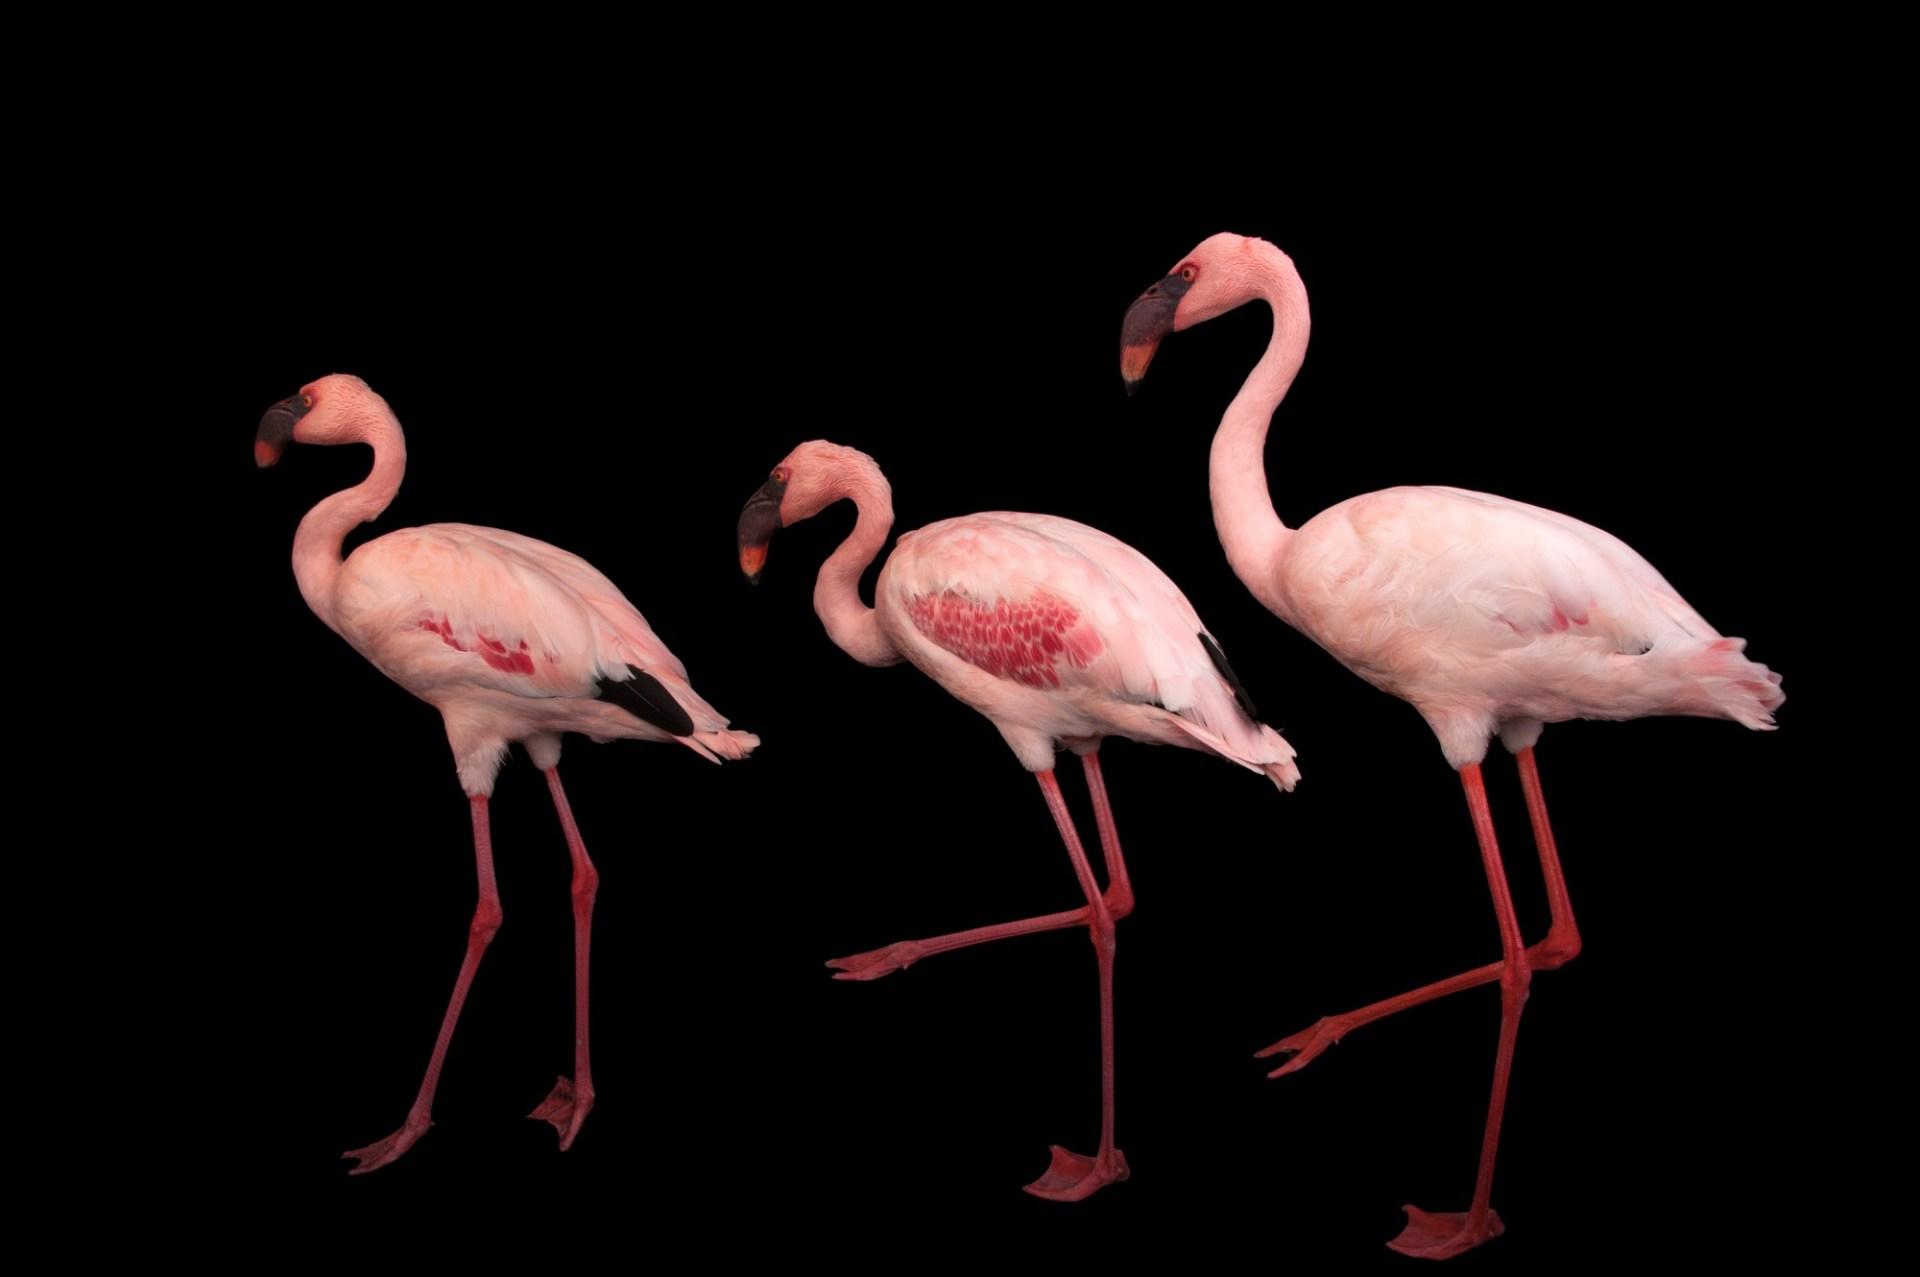 Photo: Lesser flamingos (Phoeniconaias minor) at the Cleveland Metroparks Zoo.